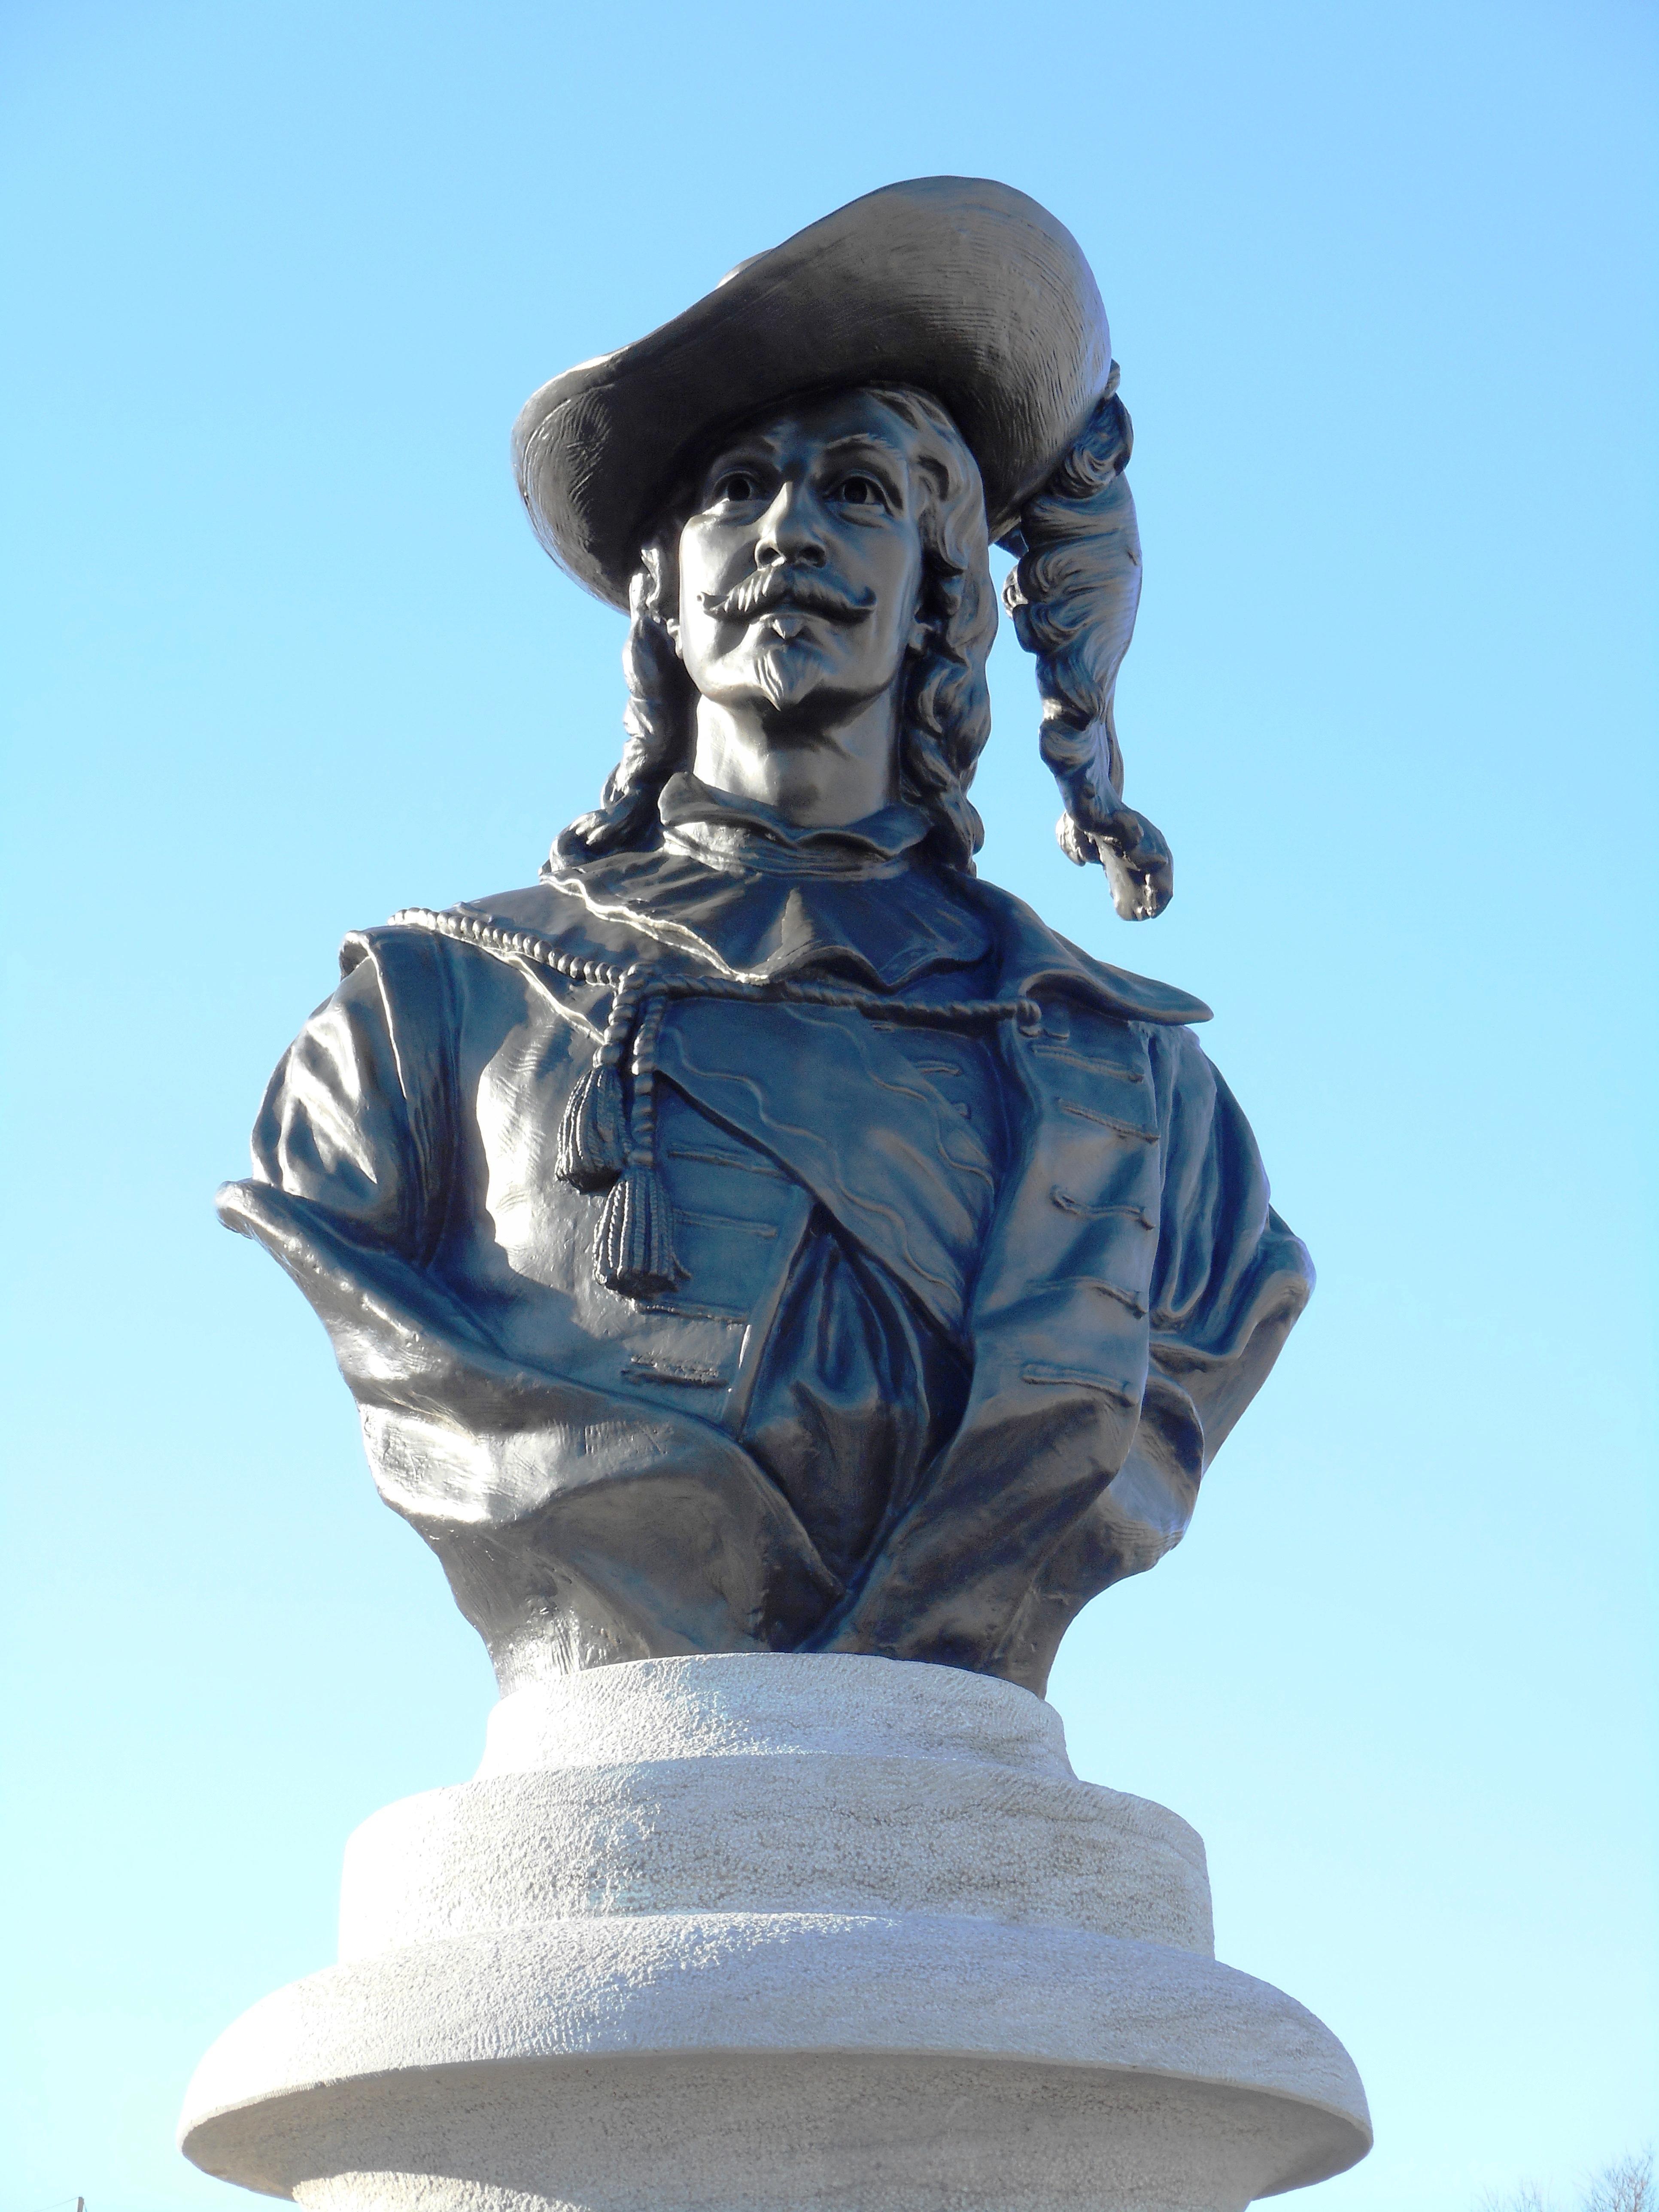 File:Monument de Pierre Du Gua de Monts 06.jpg - Wikimedia